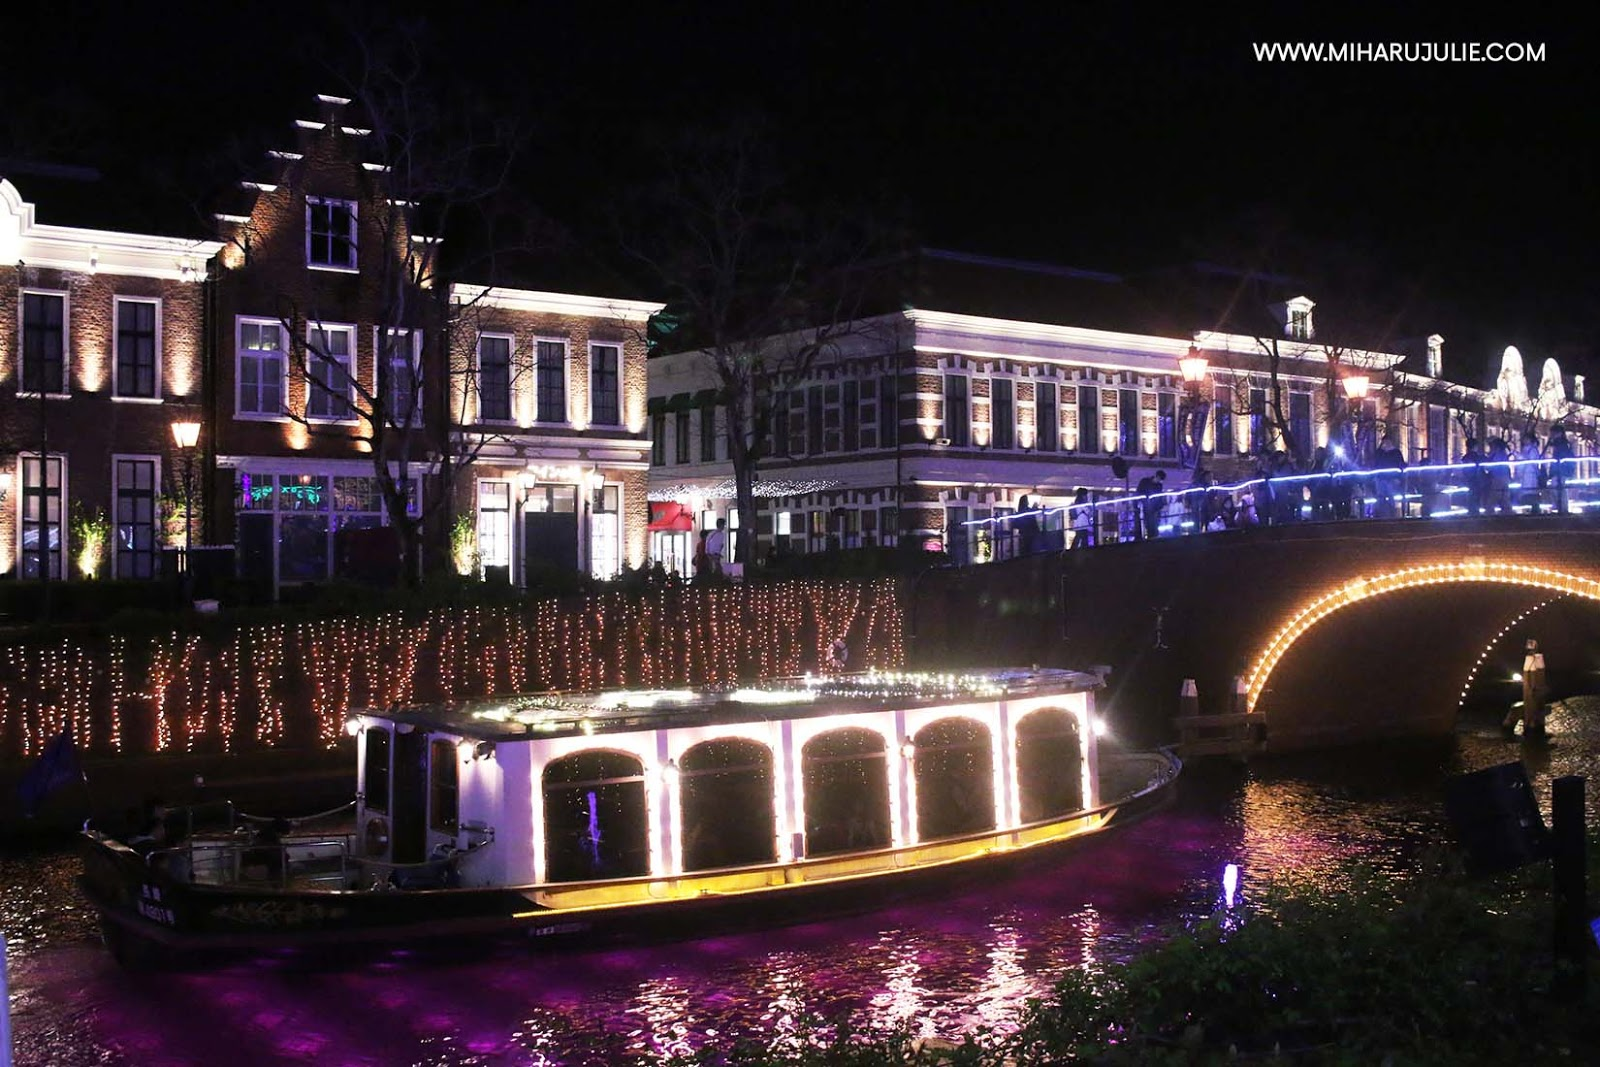 Huis ten bosch winter illumination in japan indonesia for Huis ten bosch ticket